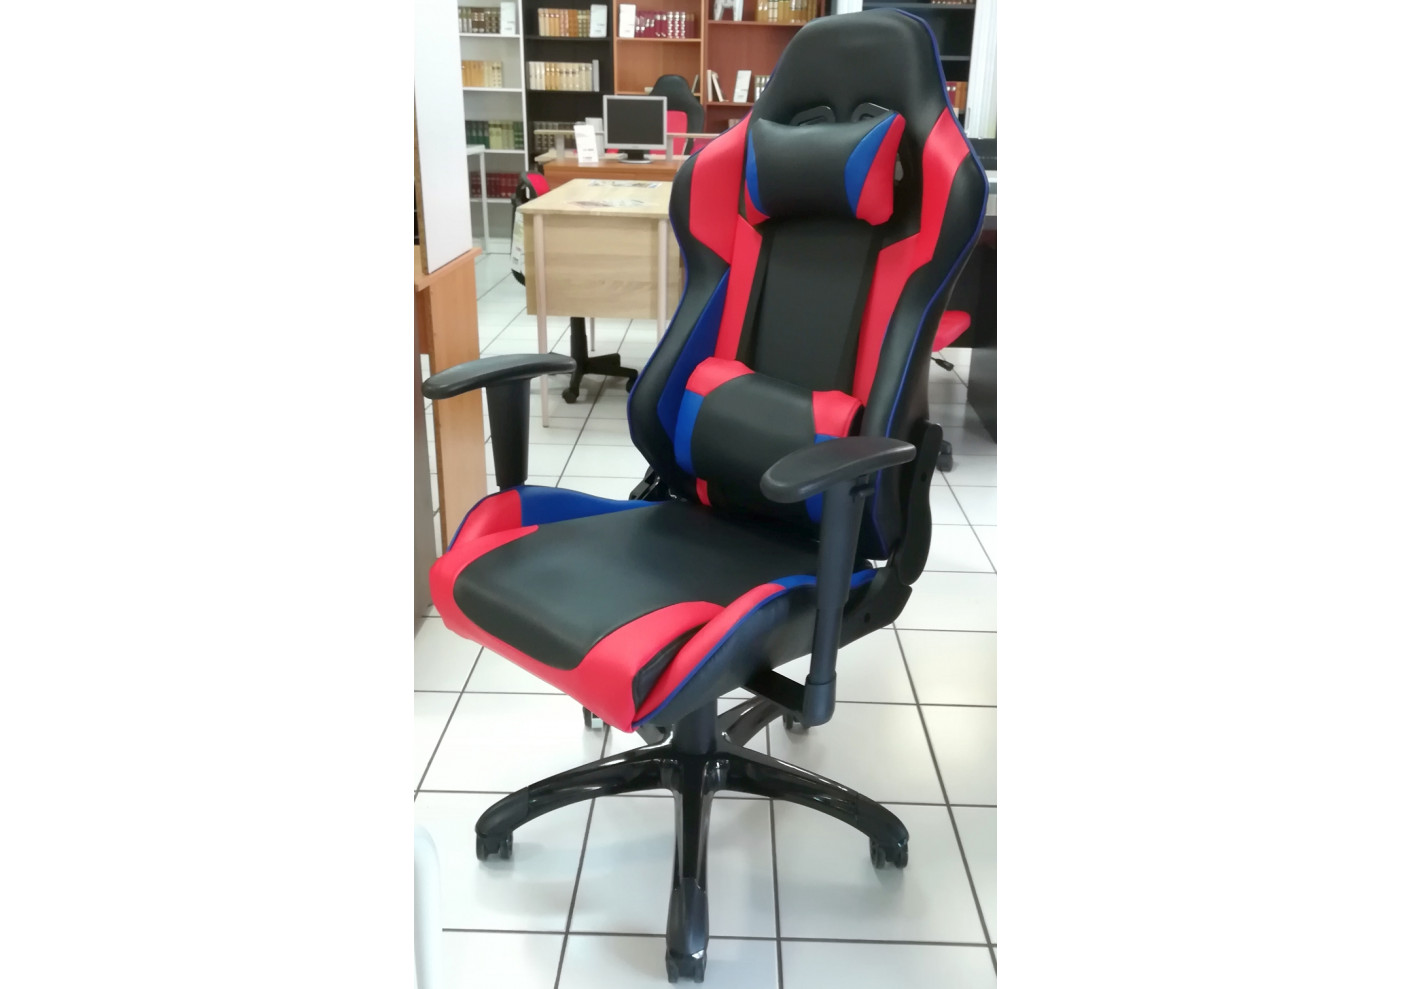 Fauteuil de bureau gamer duo noir et rouge fauteuil de bureau